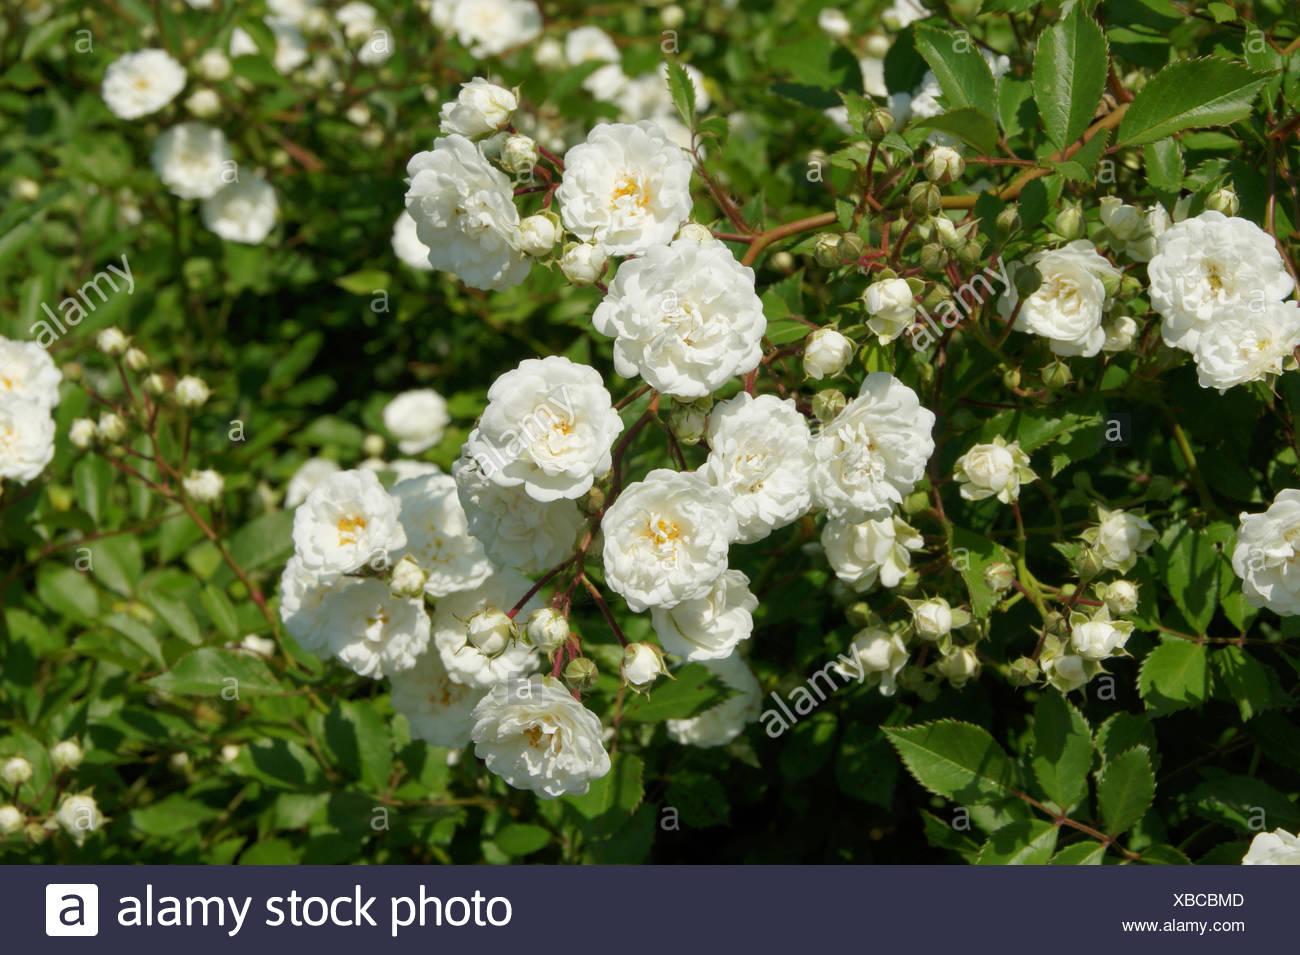 rosa schneewittchen shrub rose stock photo 282399725 alamy. Black Bedroom Furniture Sets. Home Design Ideas